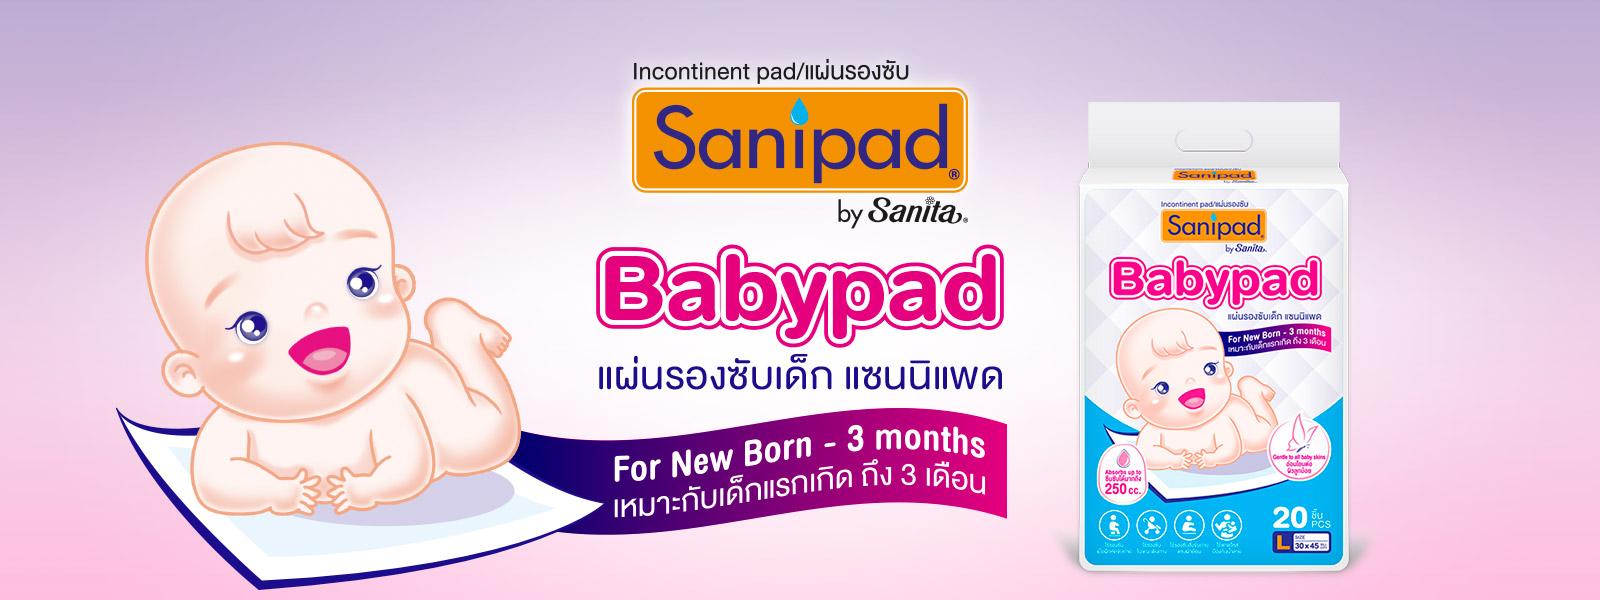 sanipad แซนนิแพด babypad แผ่นรองซับเด็ก